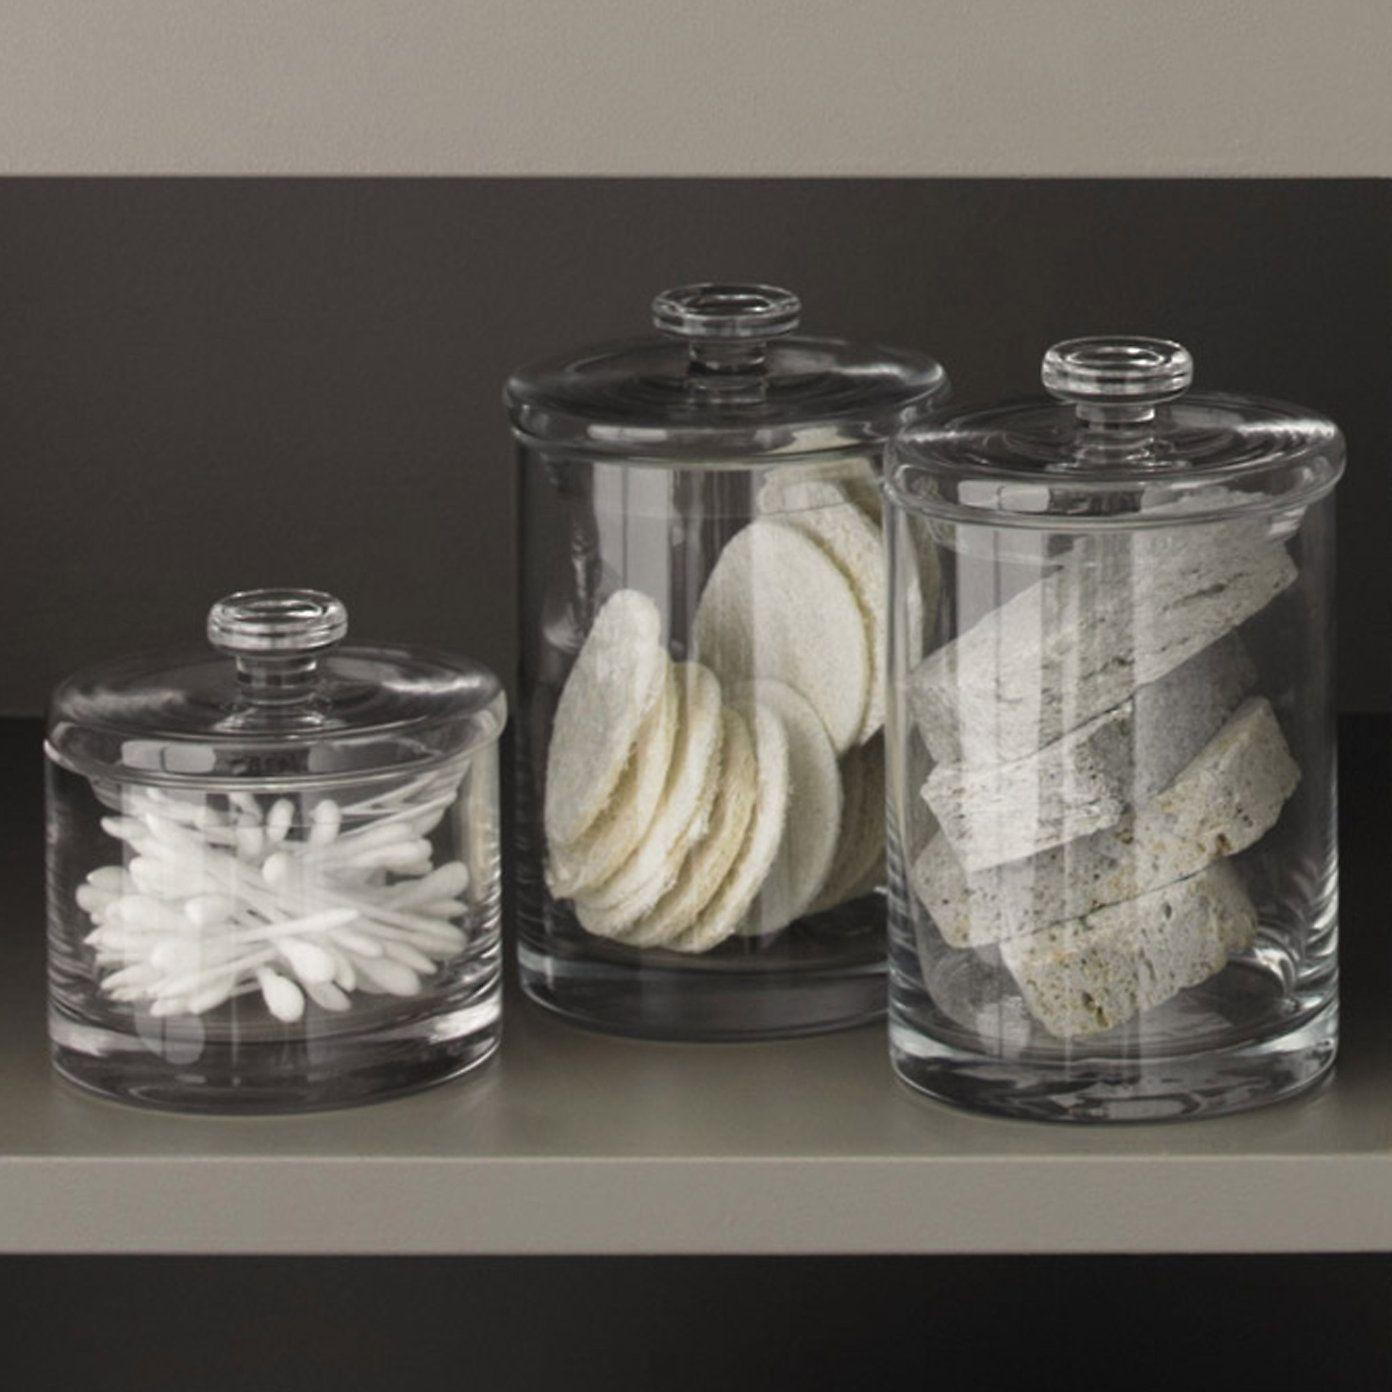 Glass Storage Jars For The Bathroom.